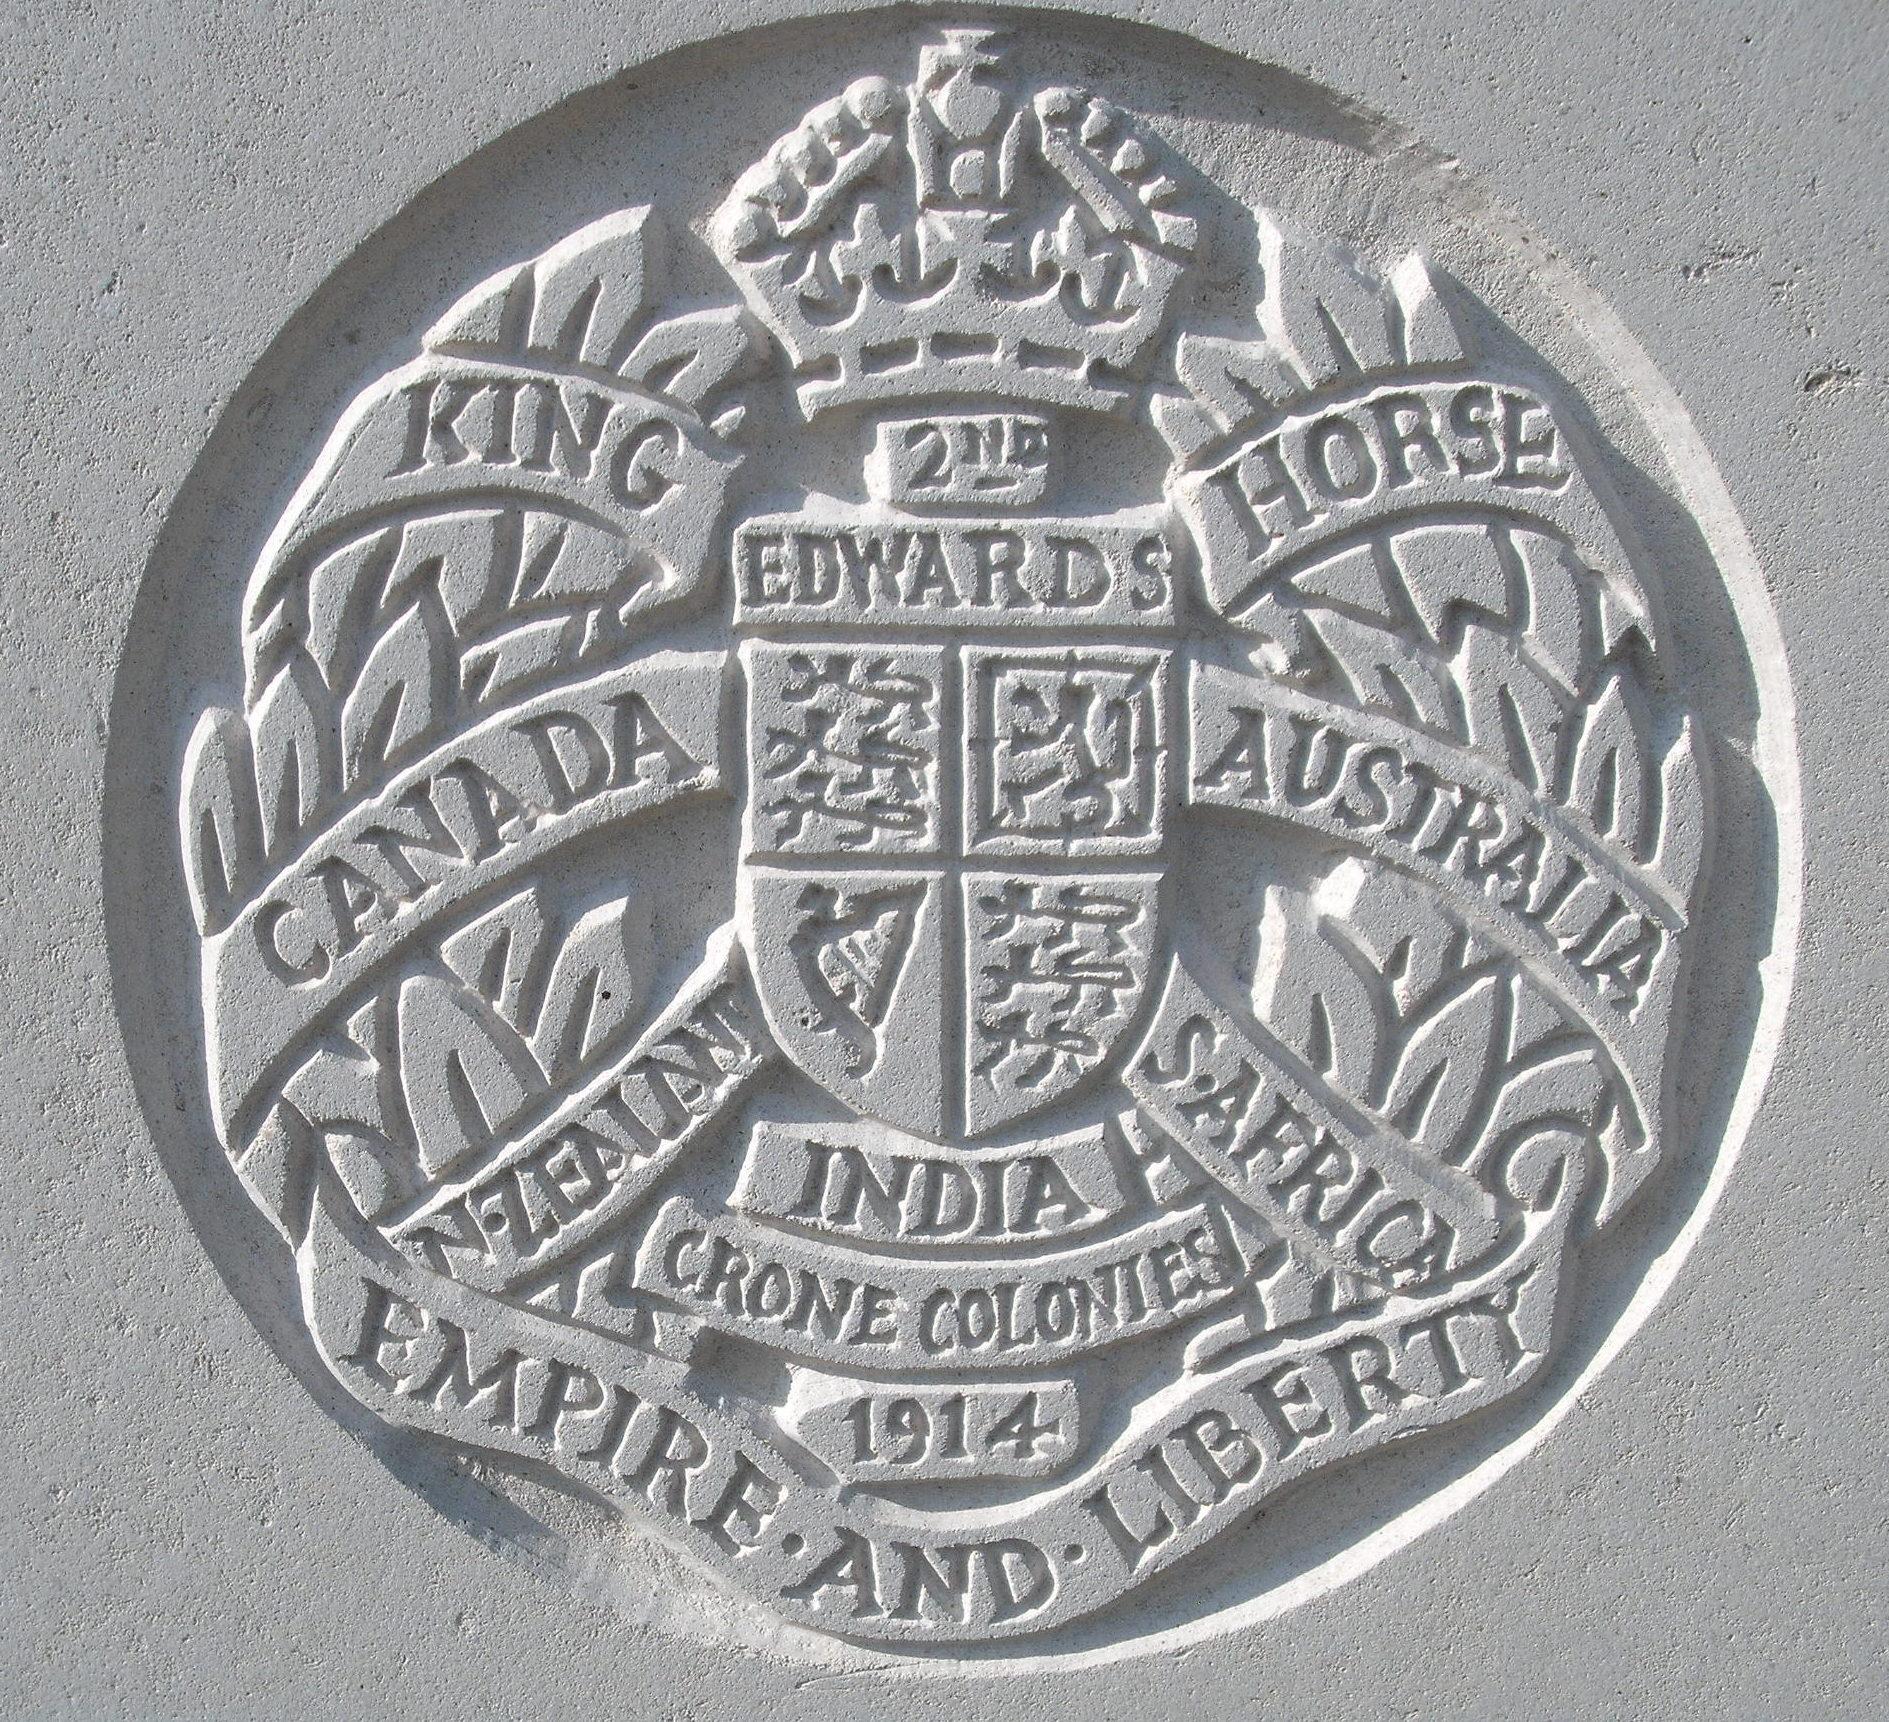 Capbadge of the 2nd King Edward's Horse